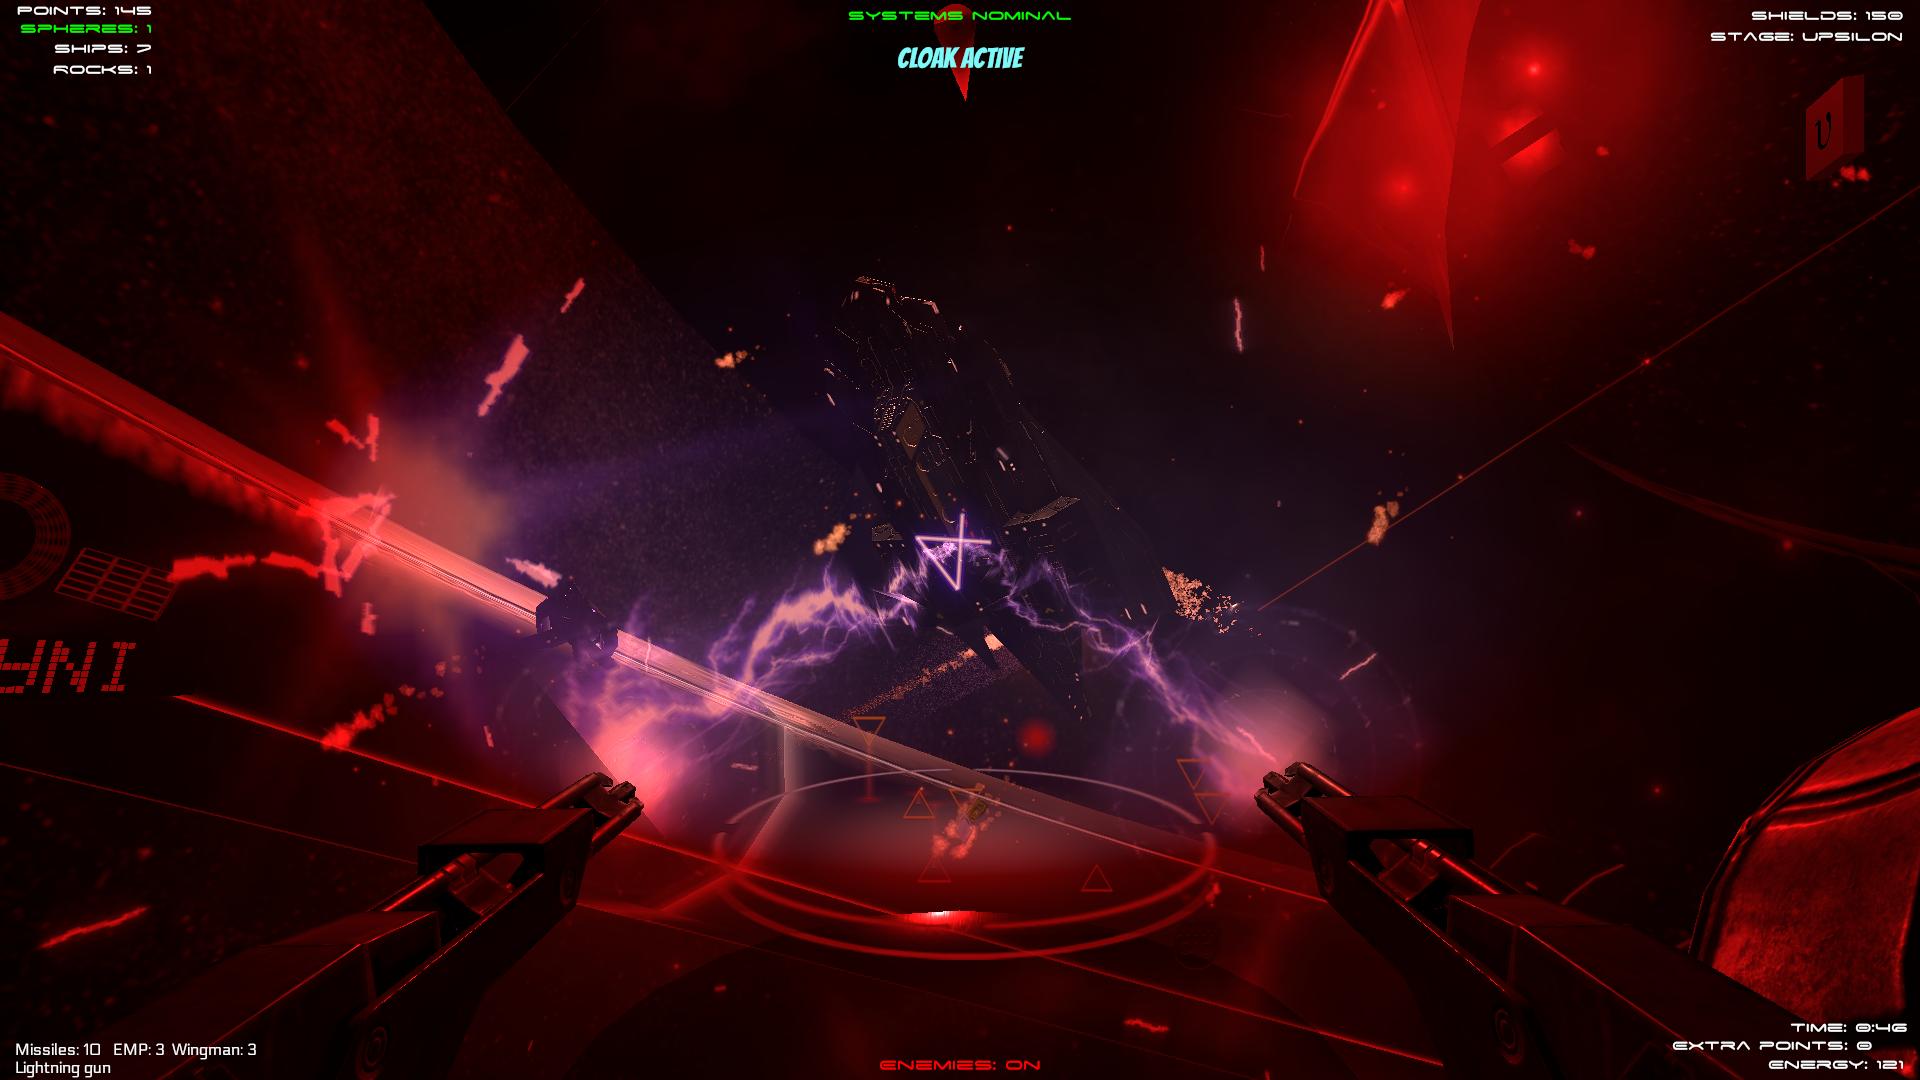 Stellar Sphere - Stellar Ring scenario